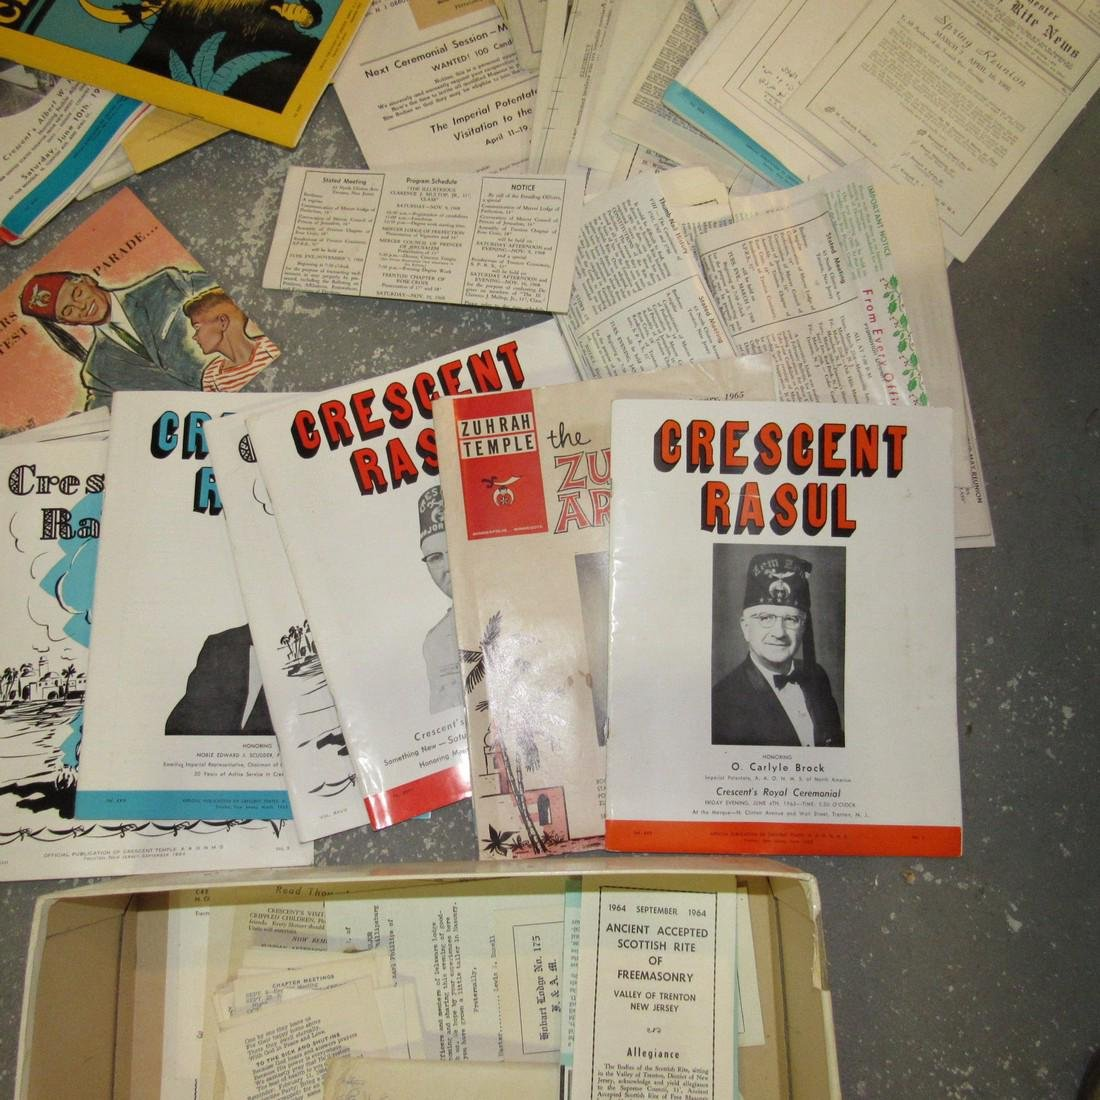 Crescent Rasul Magazines Shrine Masonic Lot - 6